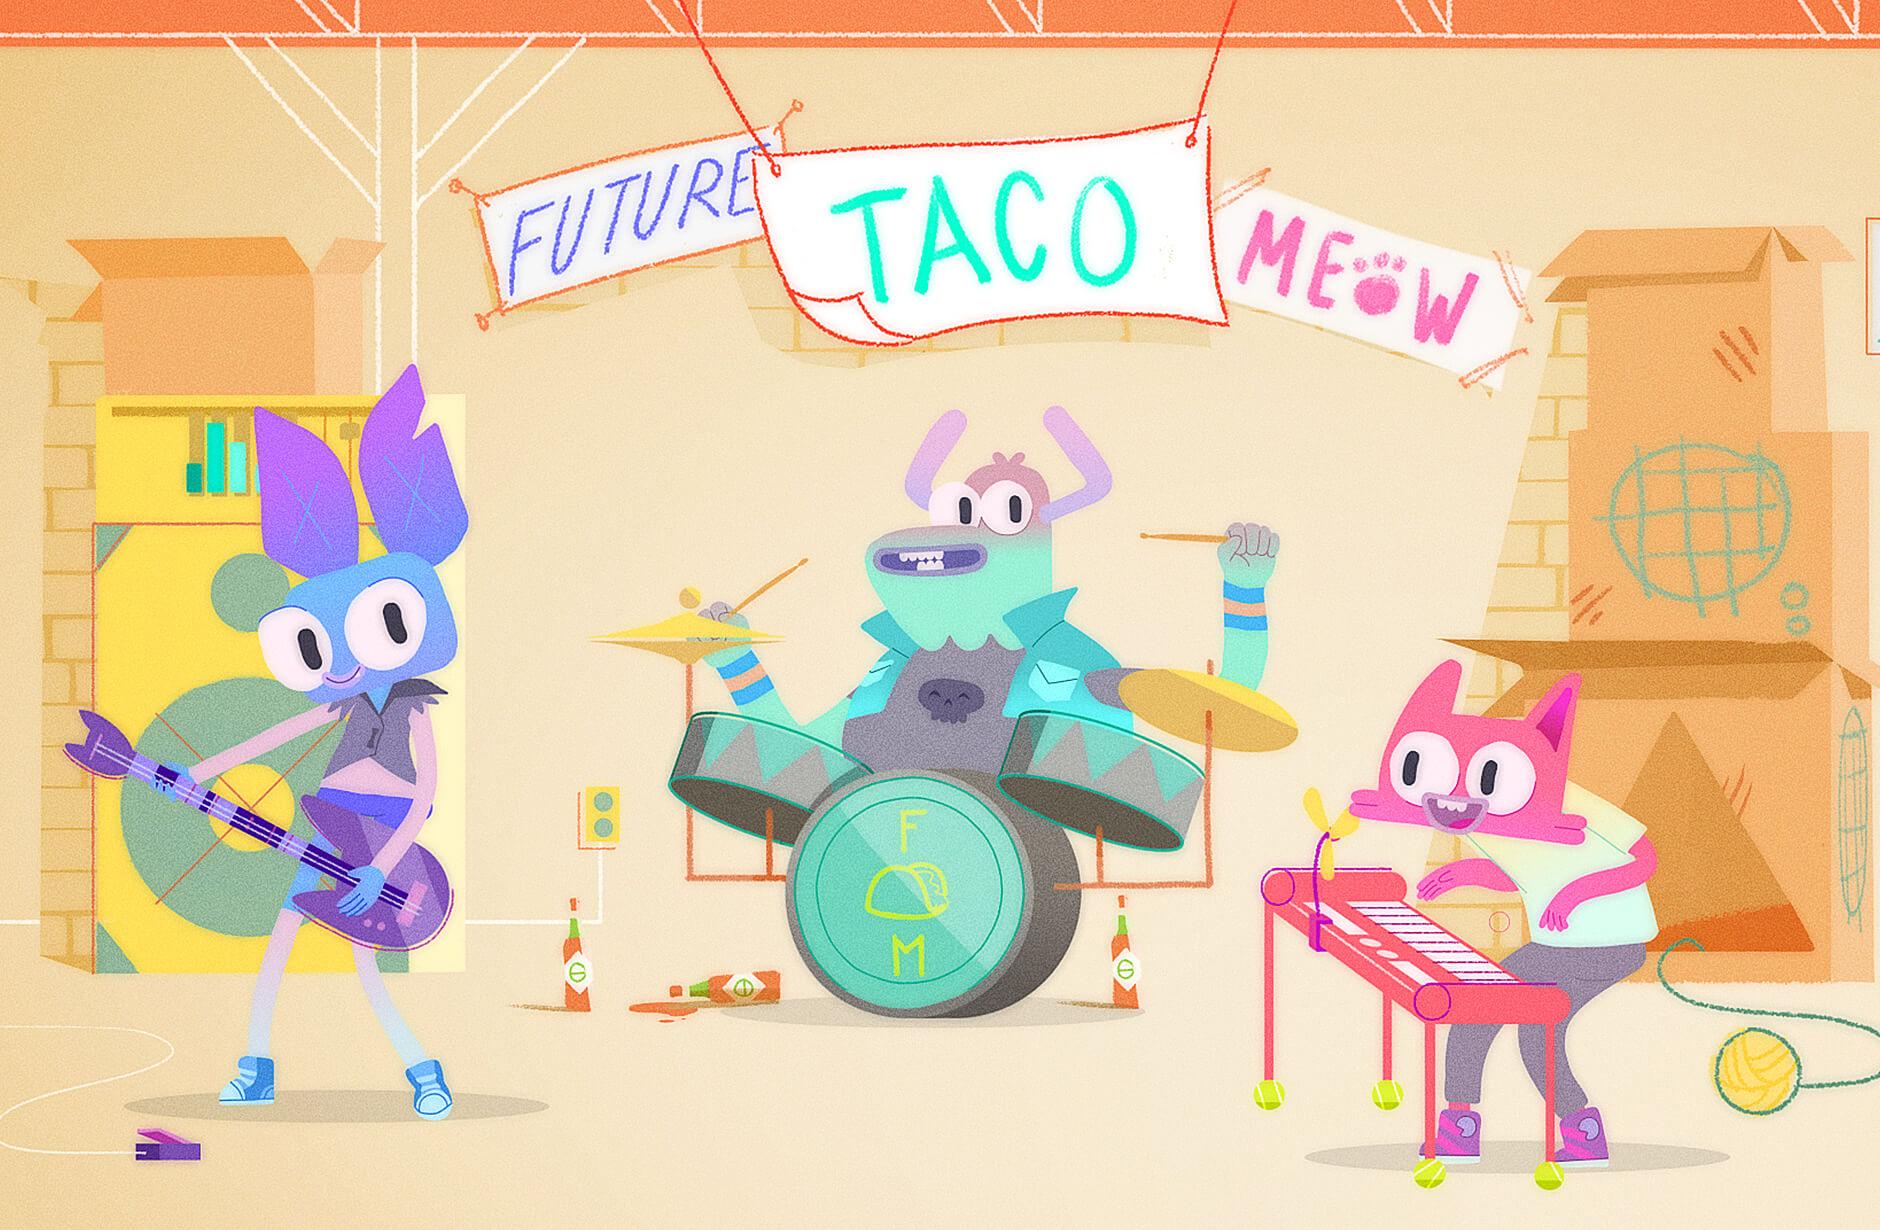 Disney animated short film Future! Taco! Meow!